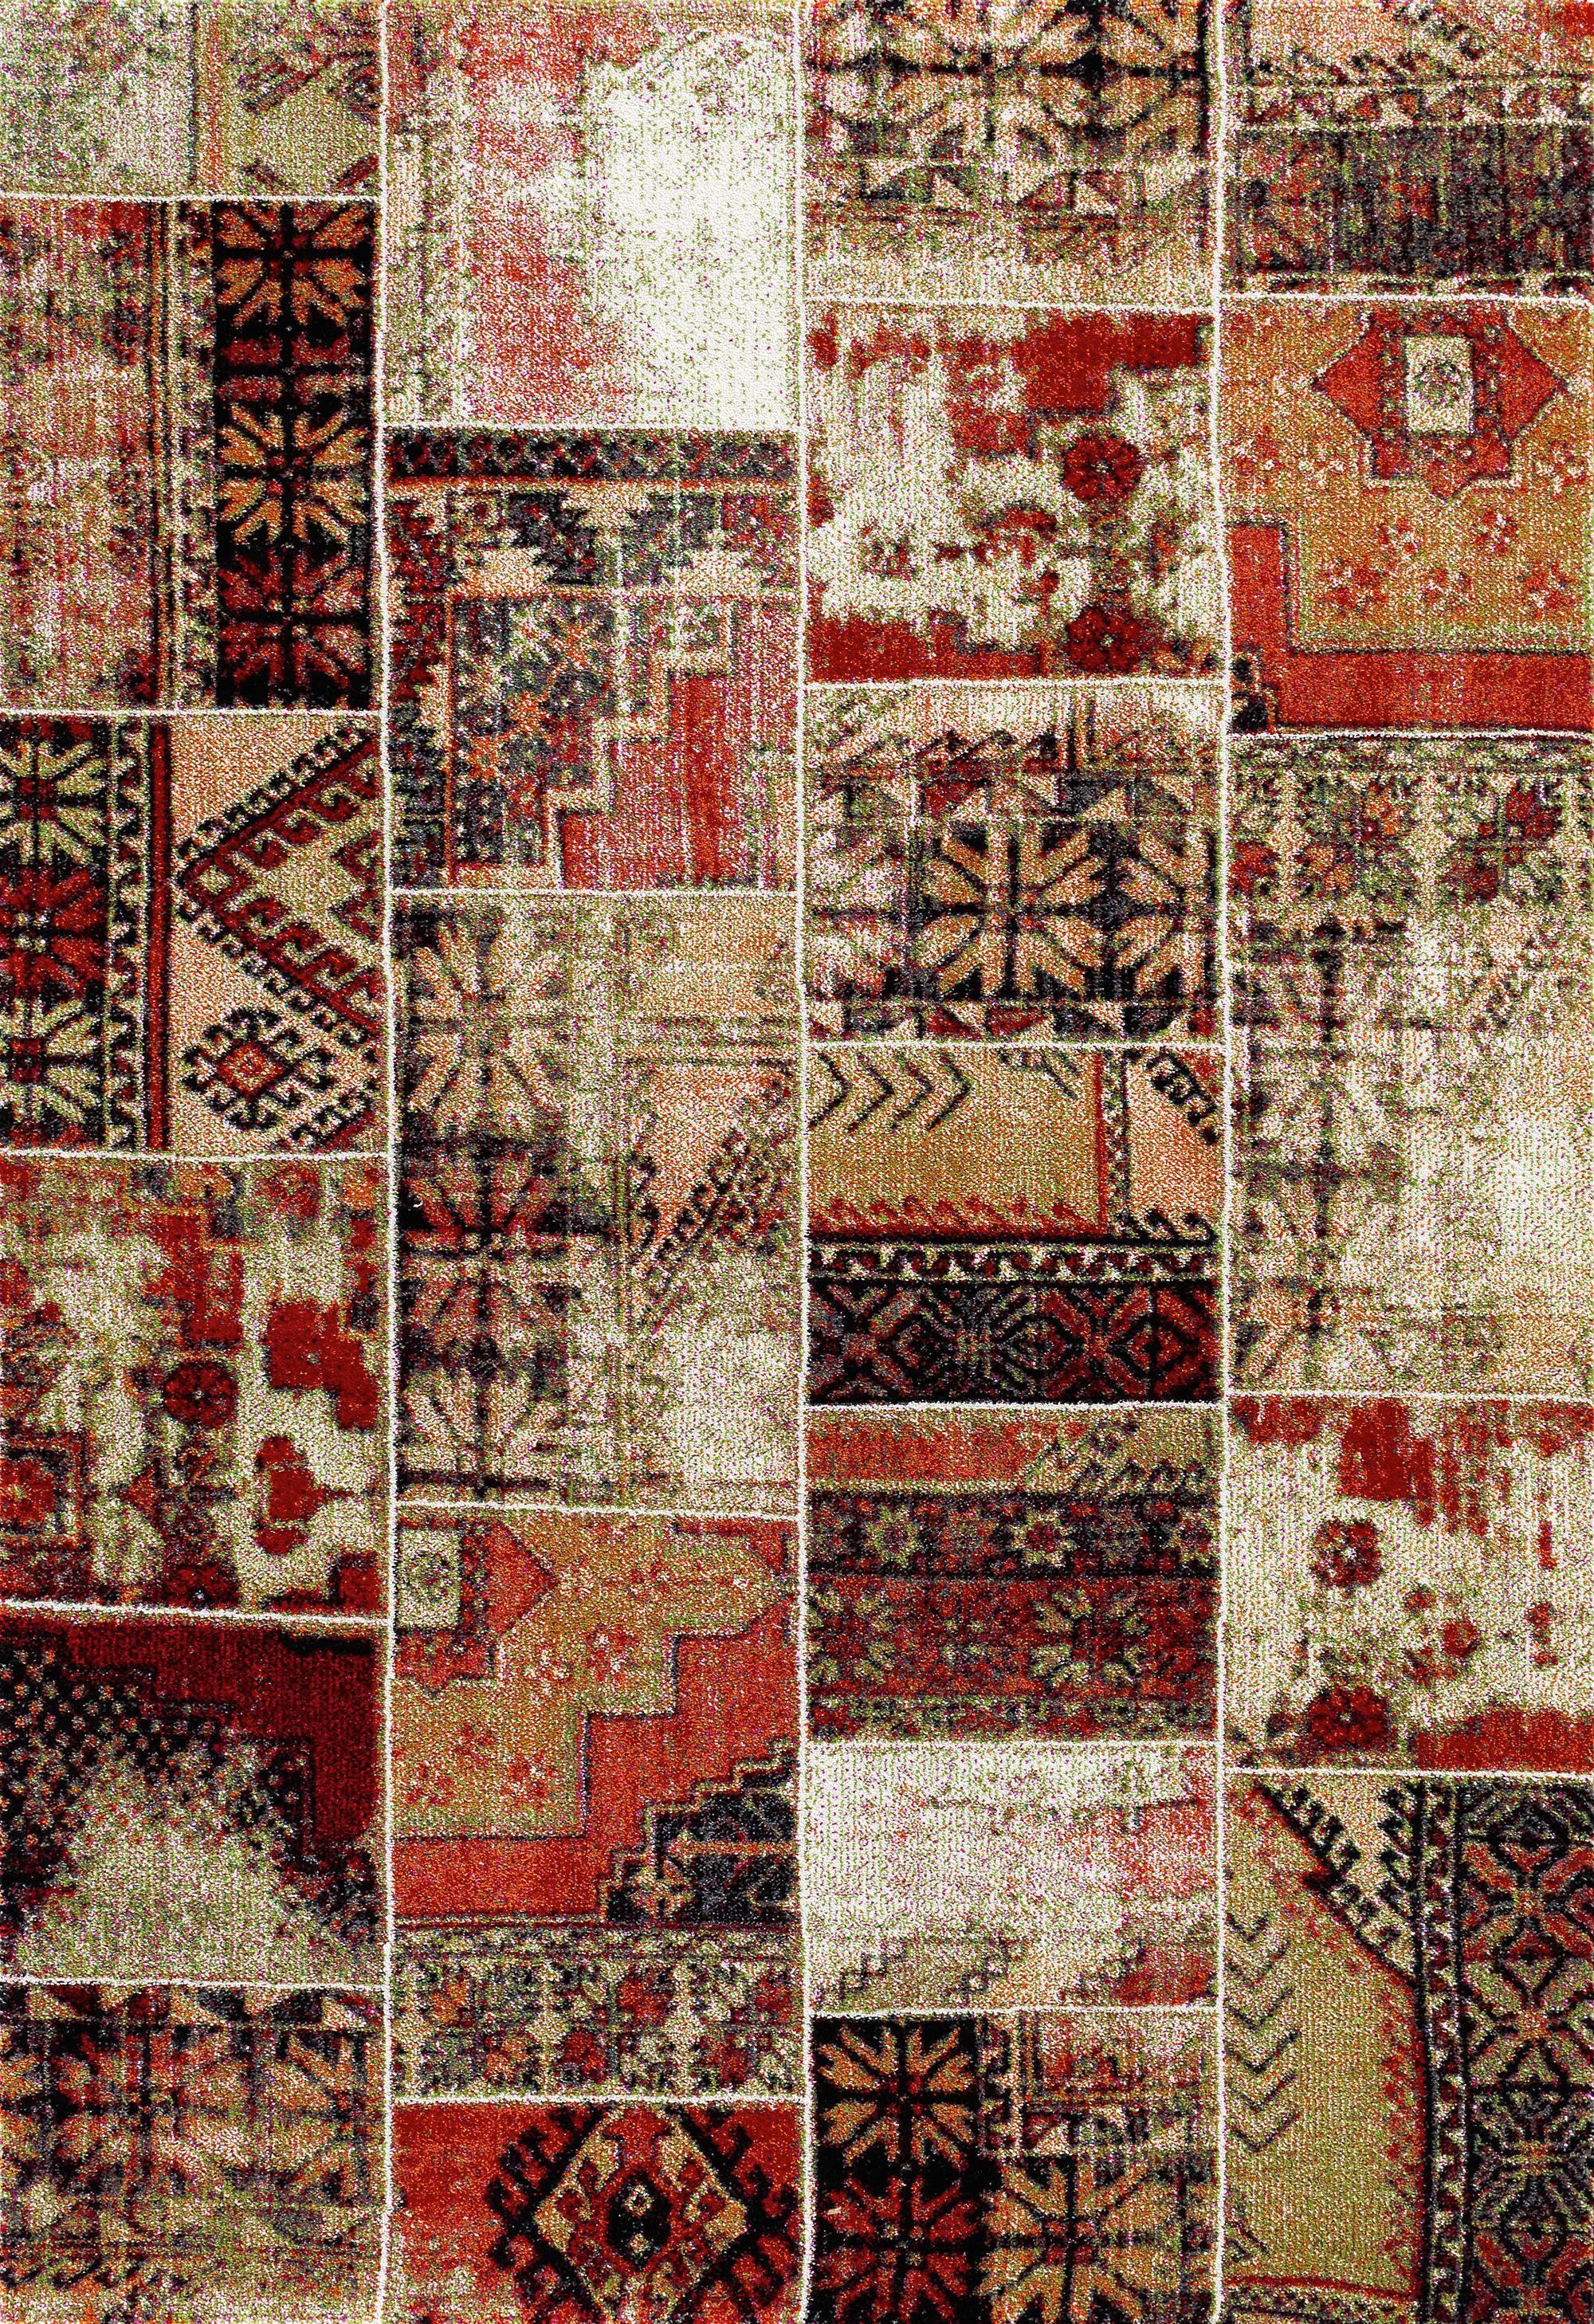 Szőnyeg Diamond - multicolor, modern, textil (160/230cm) - MÖMAX modern living